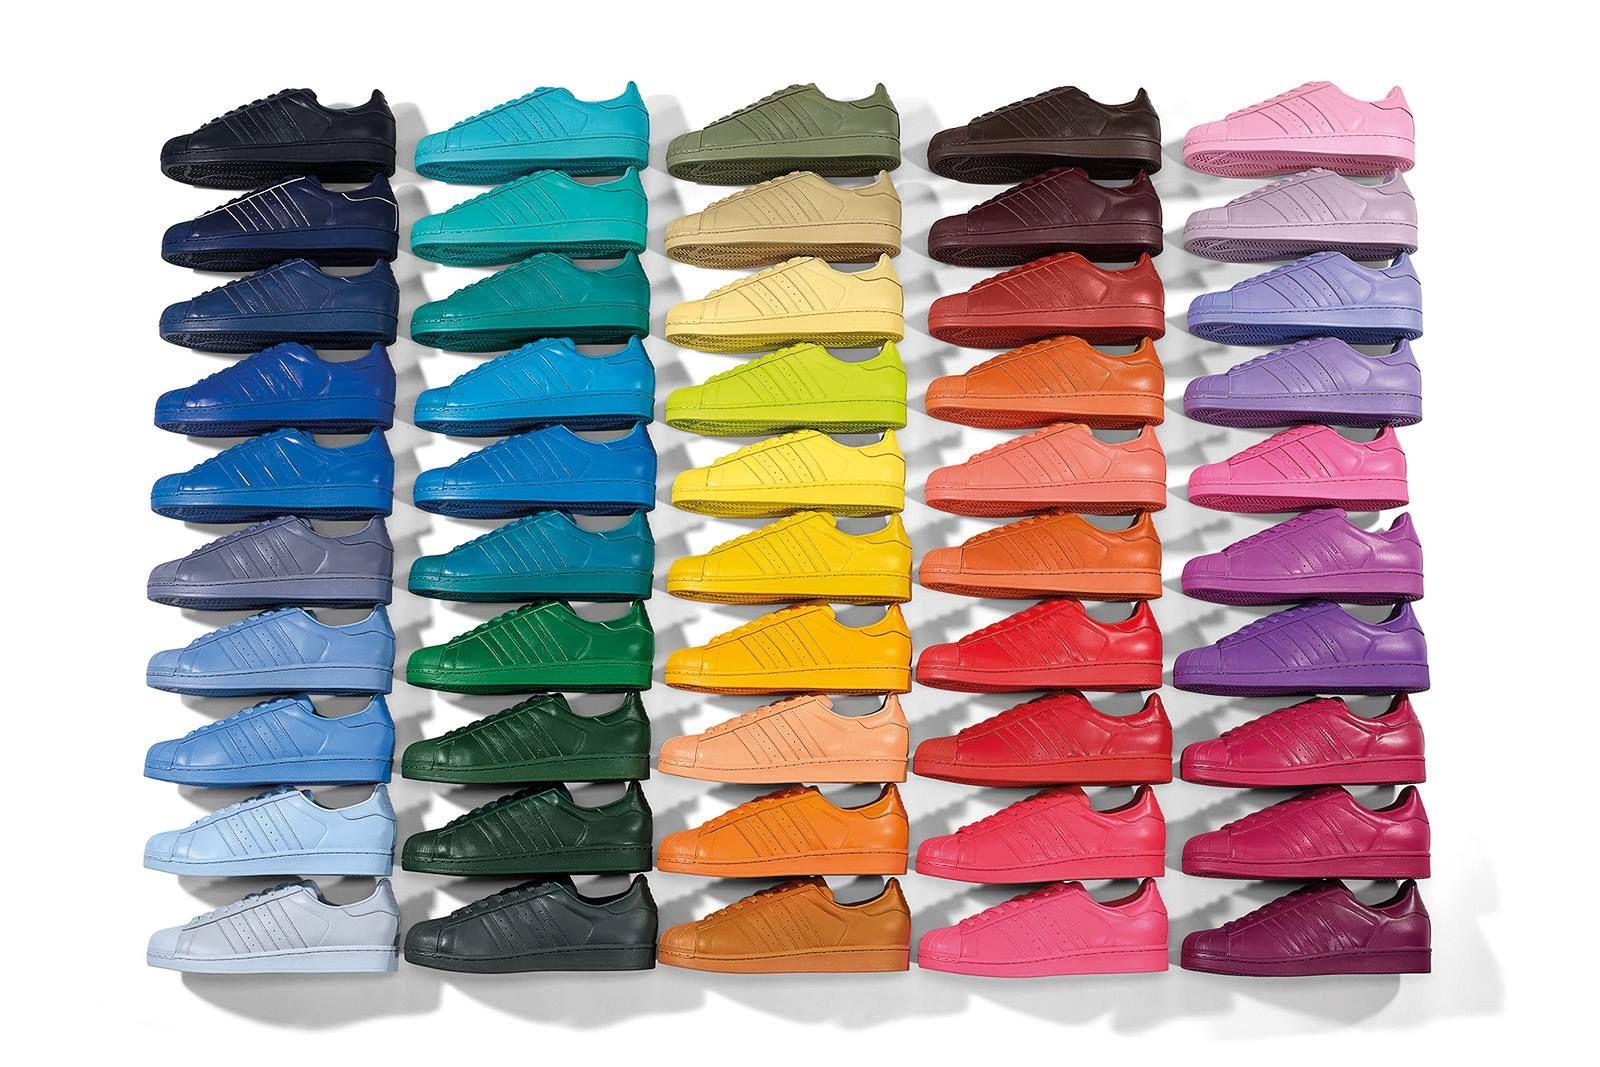 pick up 95595 40264 adidas Originals Superstar Supercolor 50 Colors by Pharrell Williams